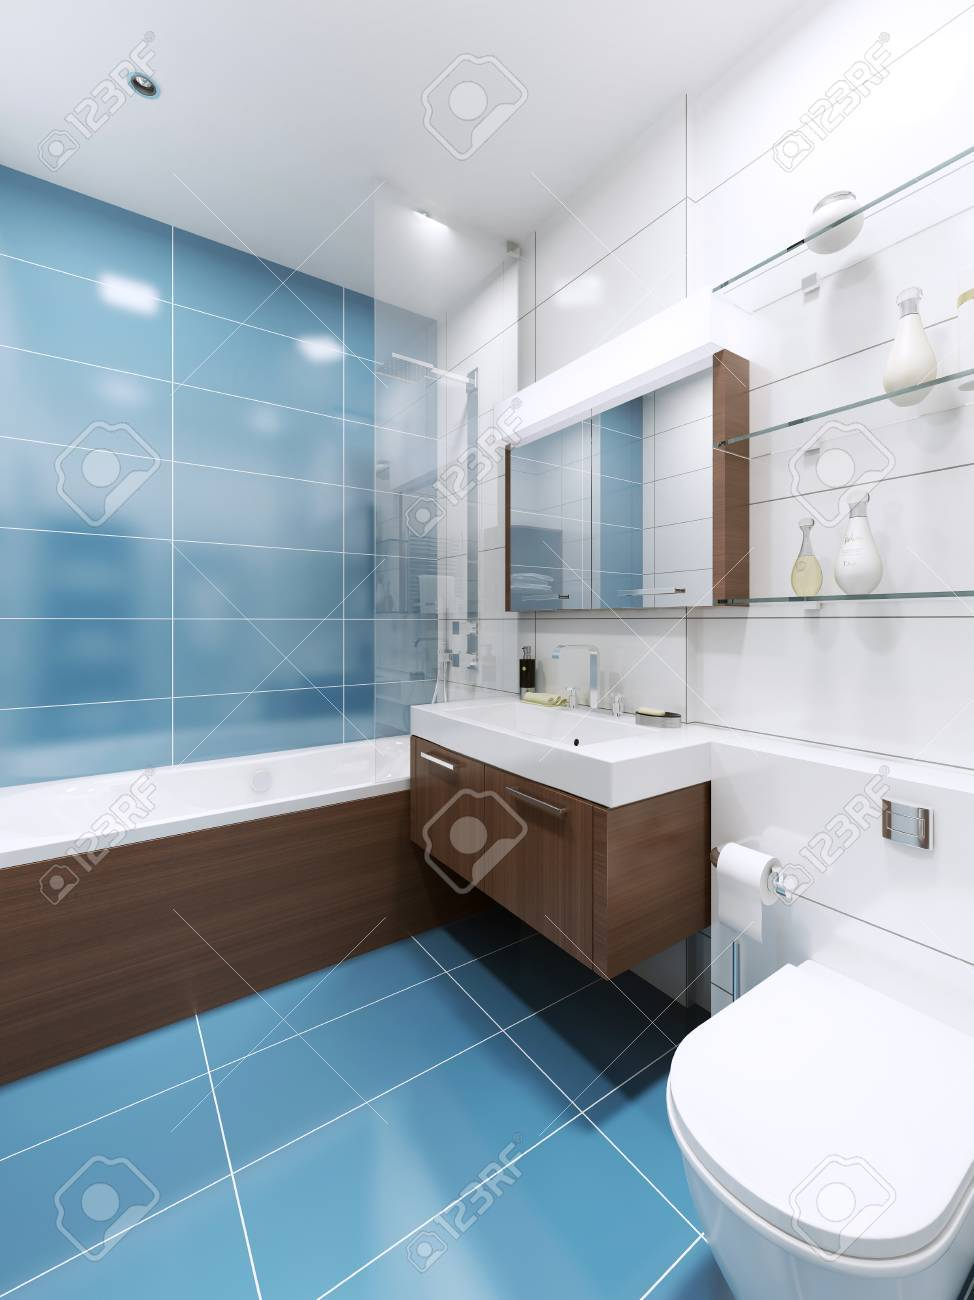 Blau Badezimmer Interieur In Privaten Haus. High-Tech-Design. 3D ...